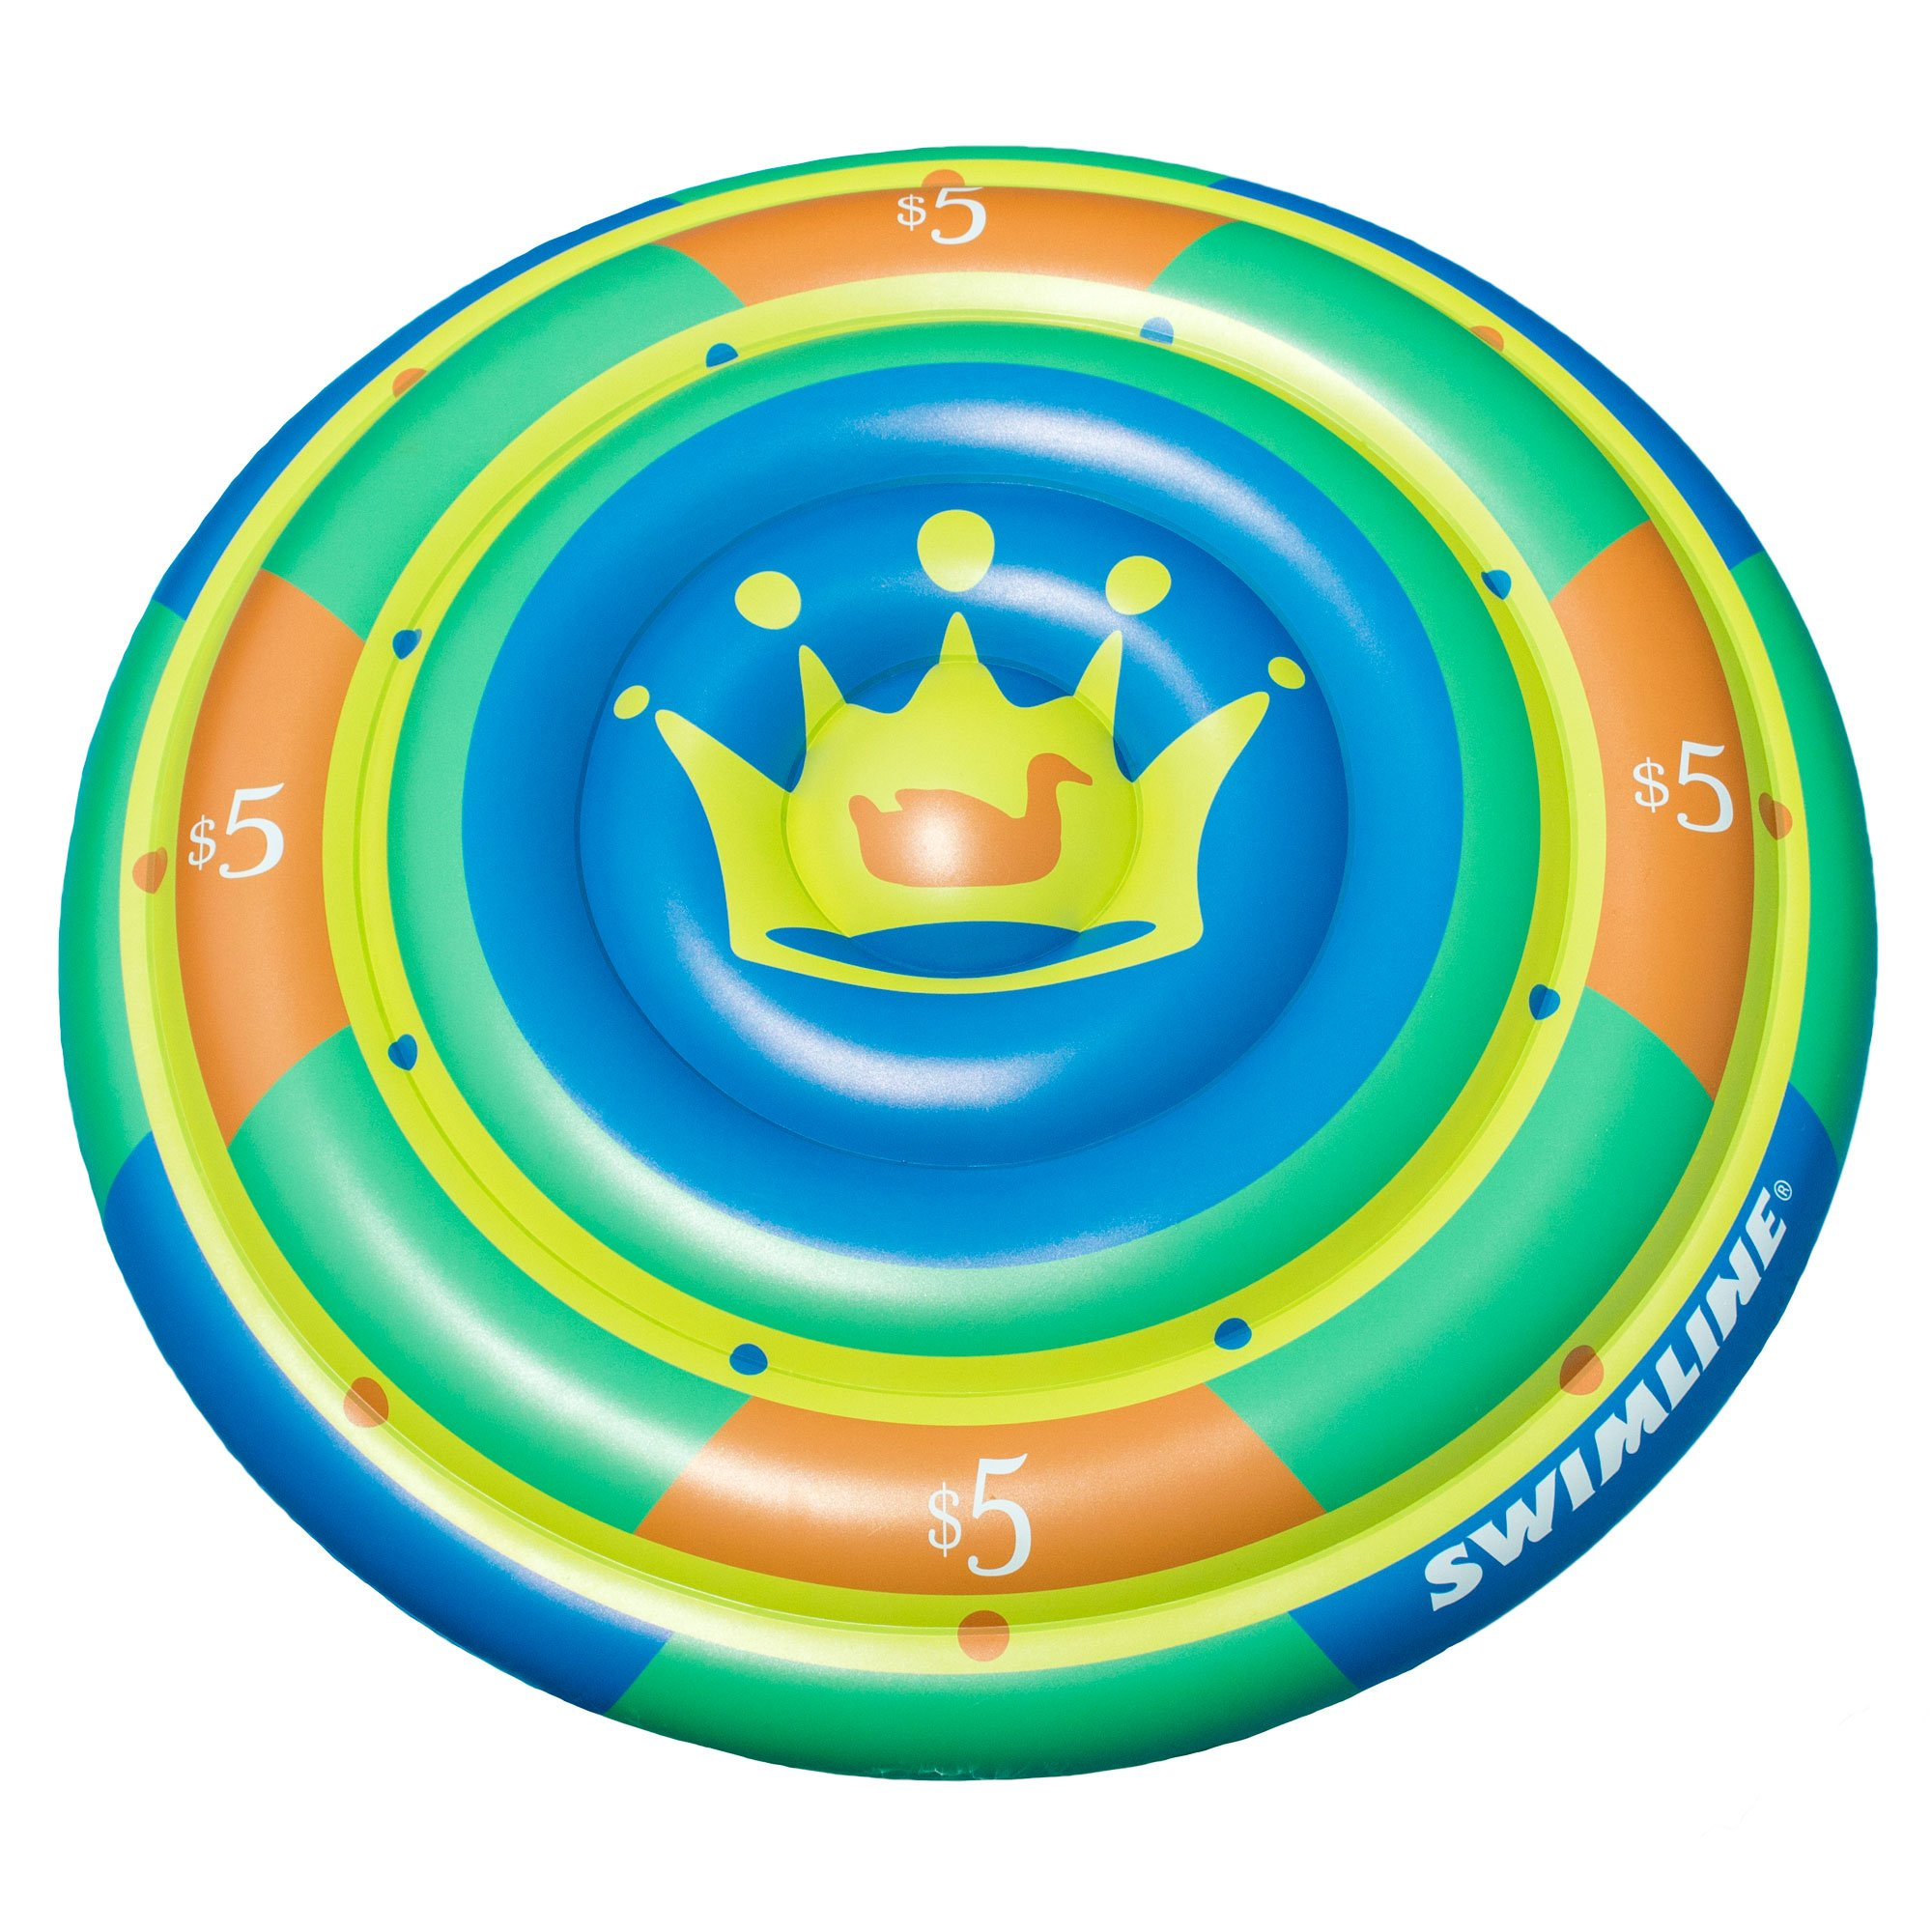 Swimline 60-Inch Inflatable Heavy-Duty Swimming Pool Orange Slice Float 2 Pack